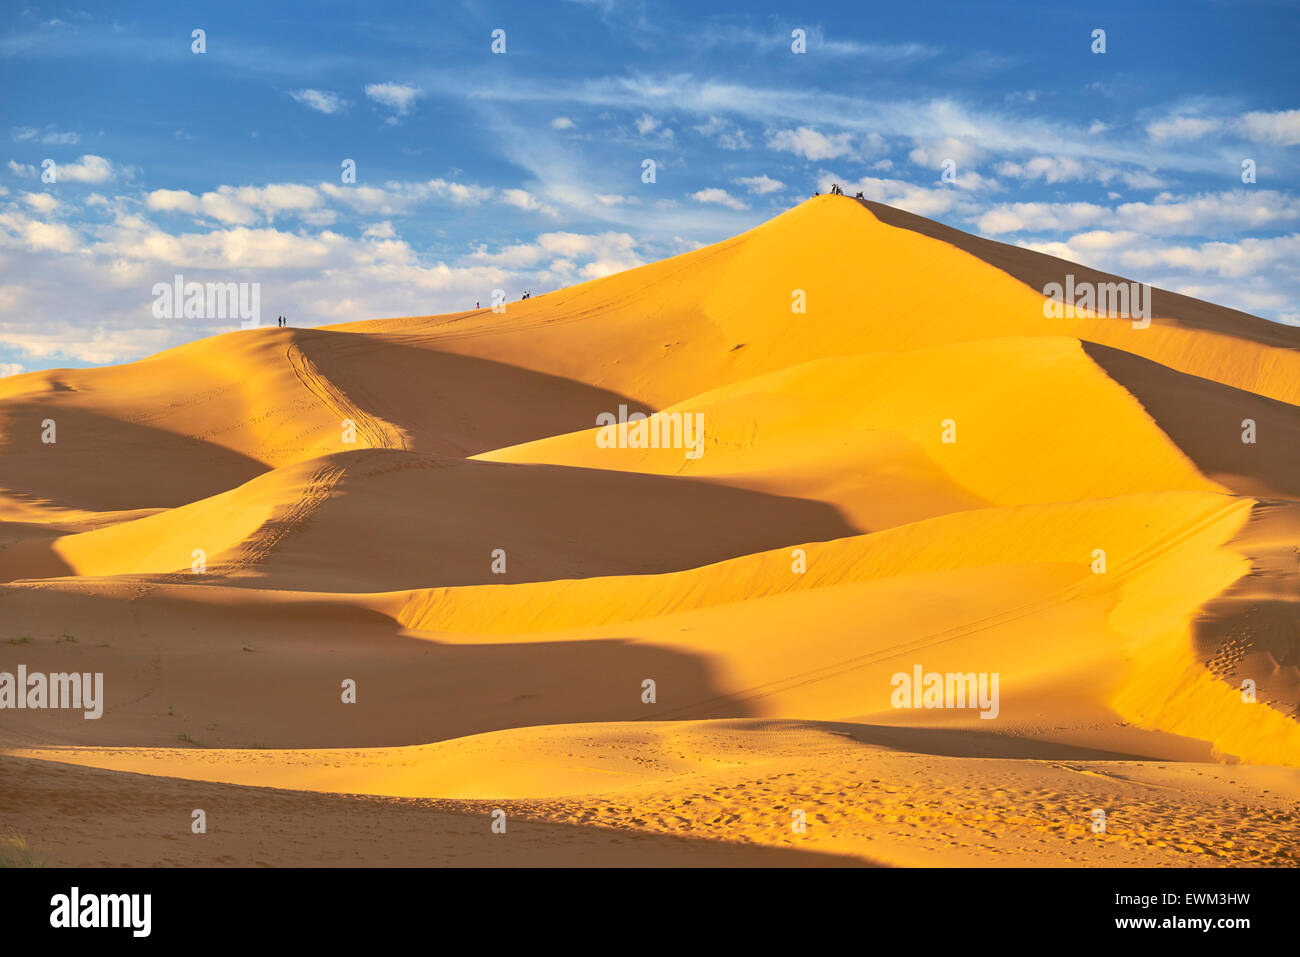 Désert Erg Chebbi près de Merzouga, Sahara, Maroc Photo Stock